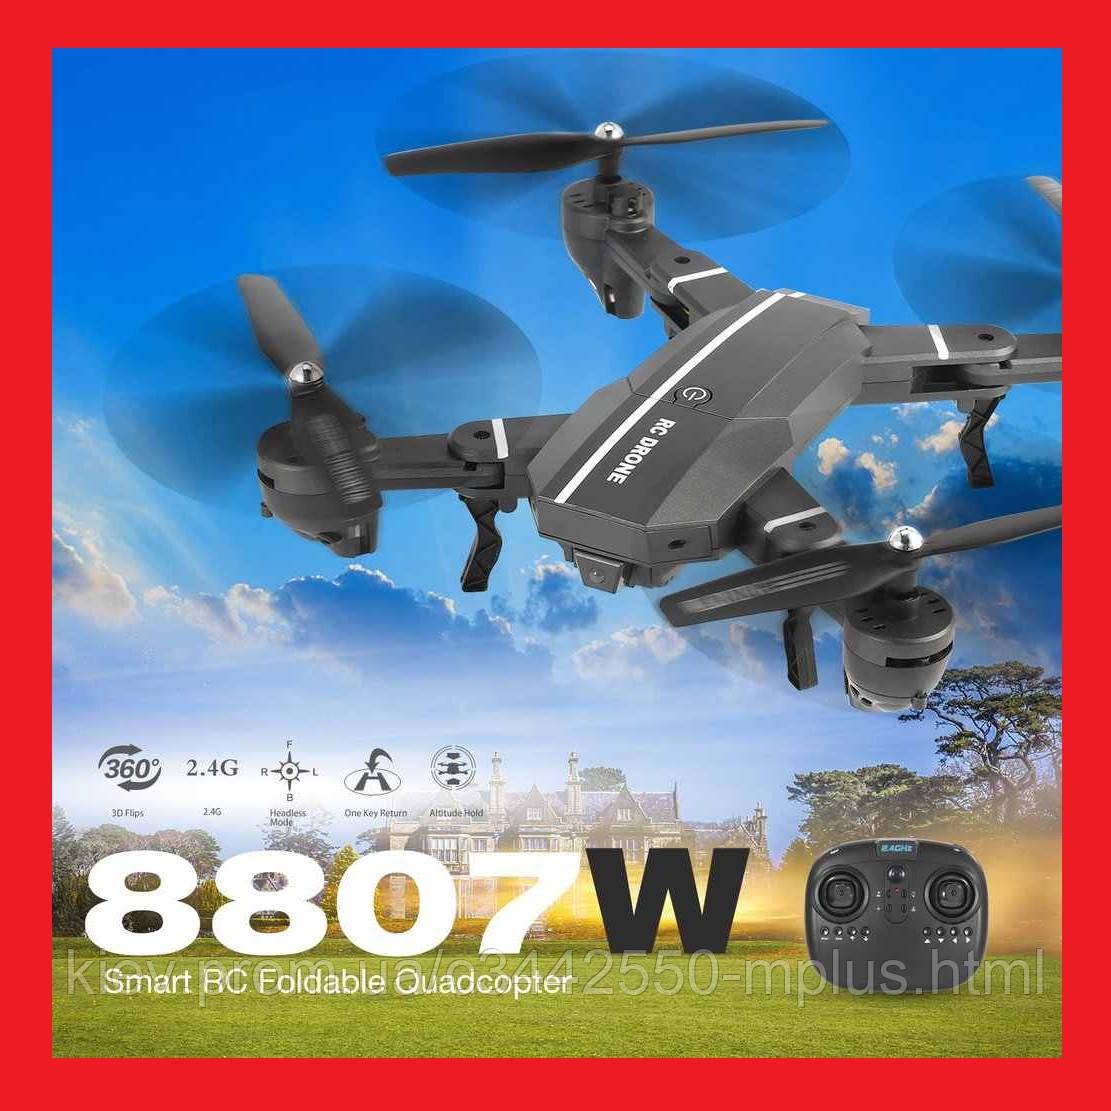 Квадрокоптер 8807 c WiFi камерой складывающийся корпус